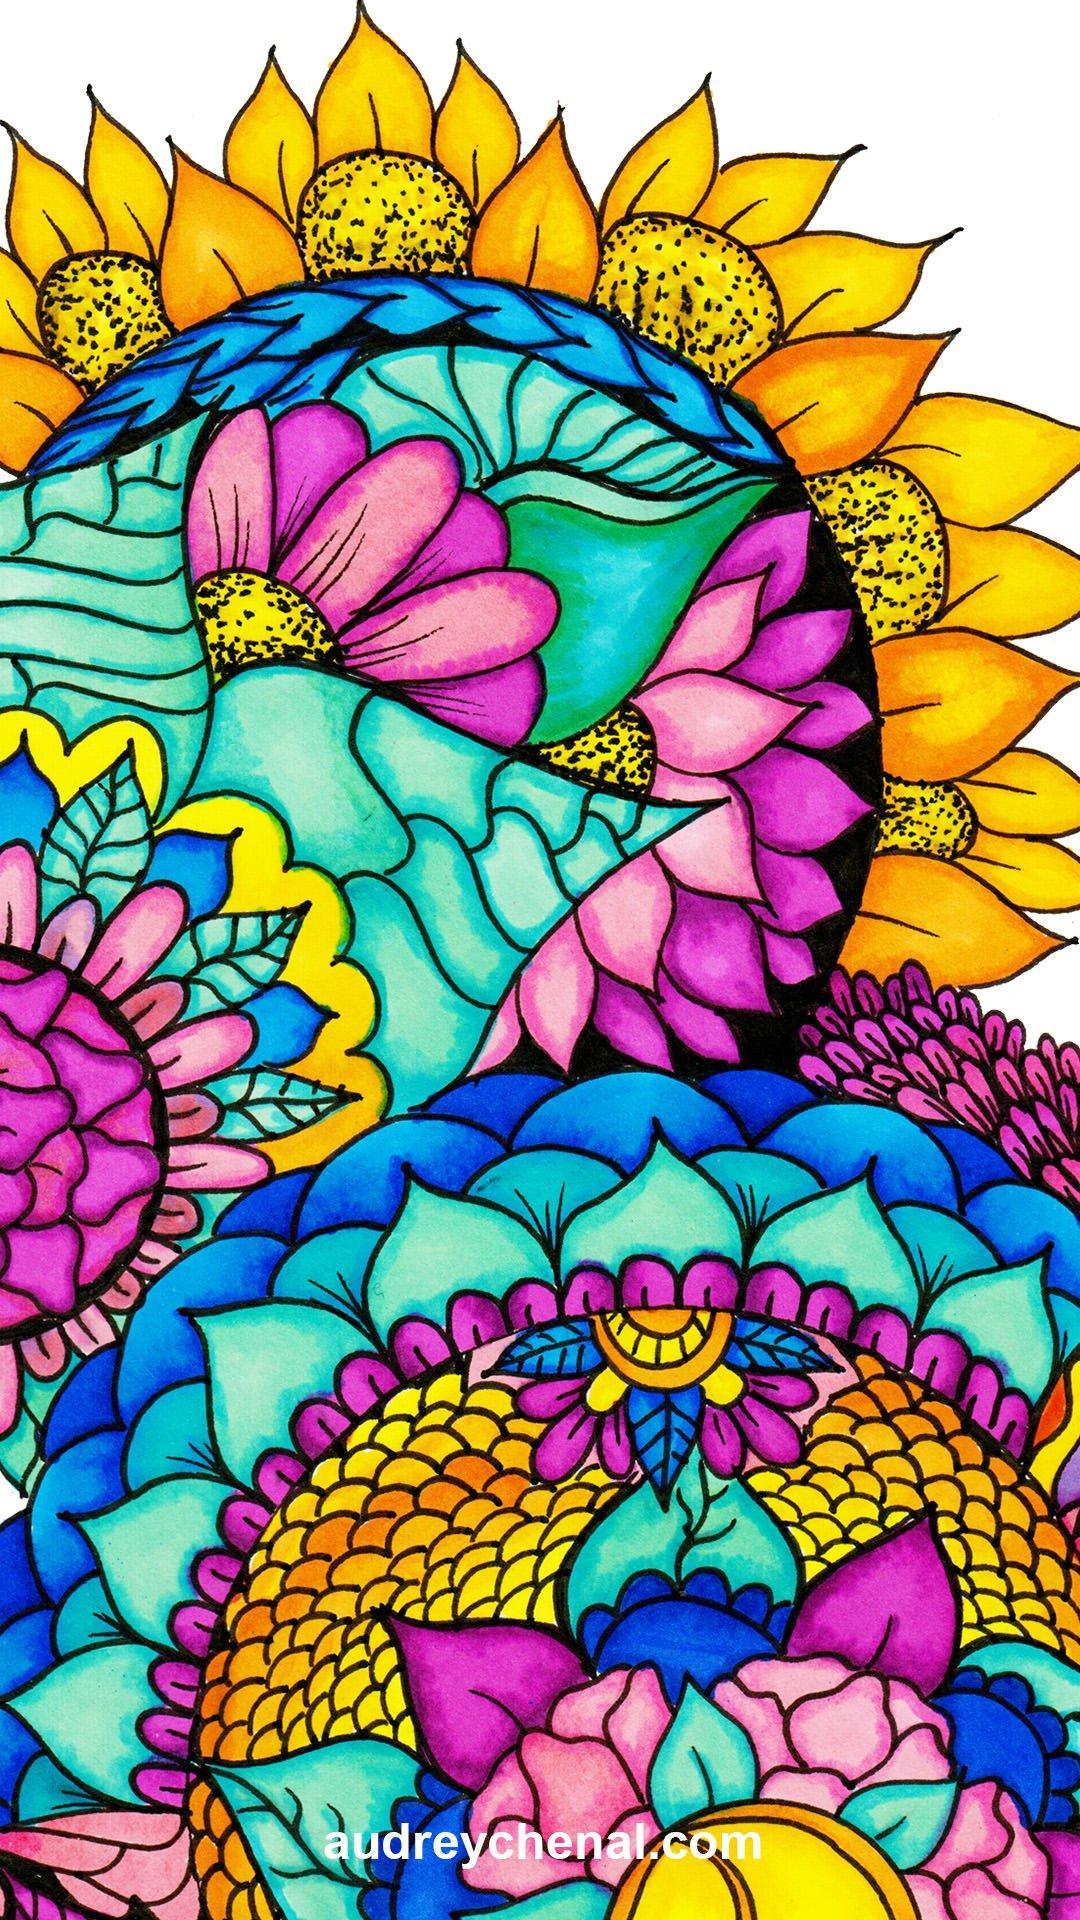 wallpaper handdrwn floral bright watercolor mandala illustration by Audrey Chenal